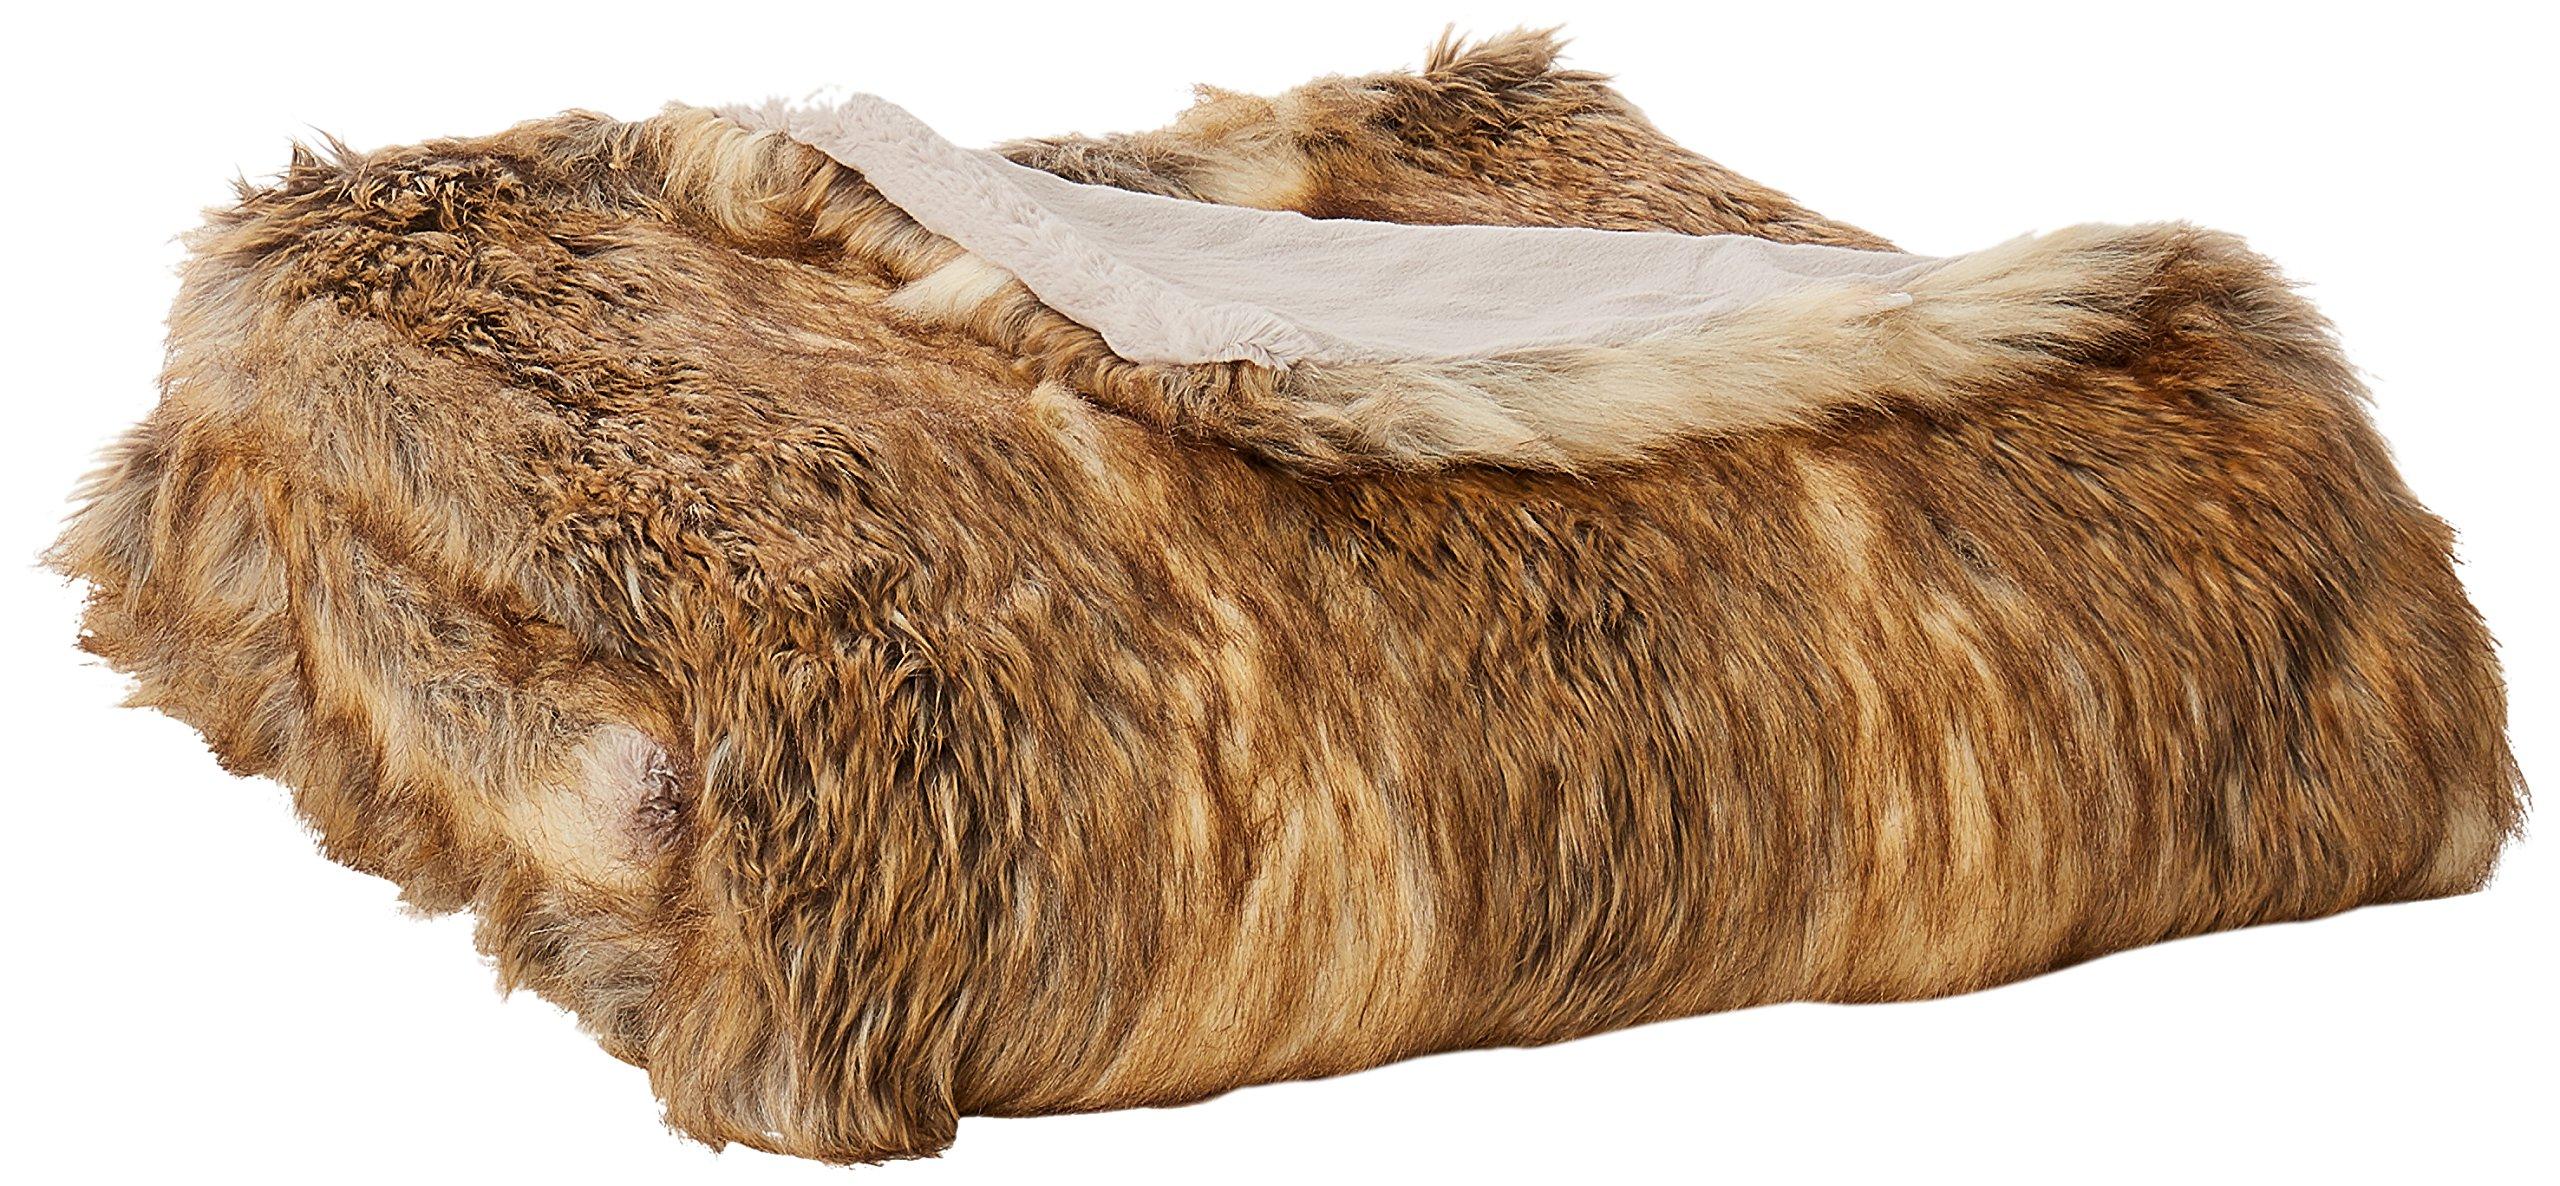 Best Home Fashion Faux Fur Throw - Lounge Blanket - Amber Fox - 58''W x 60''L - (1 Throw) by Best Home Fashion